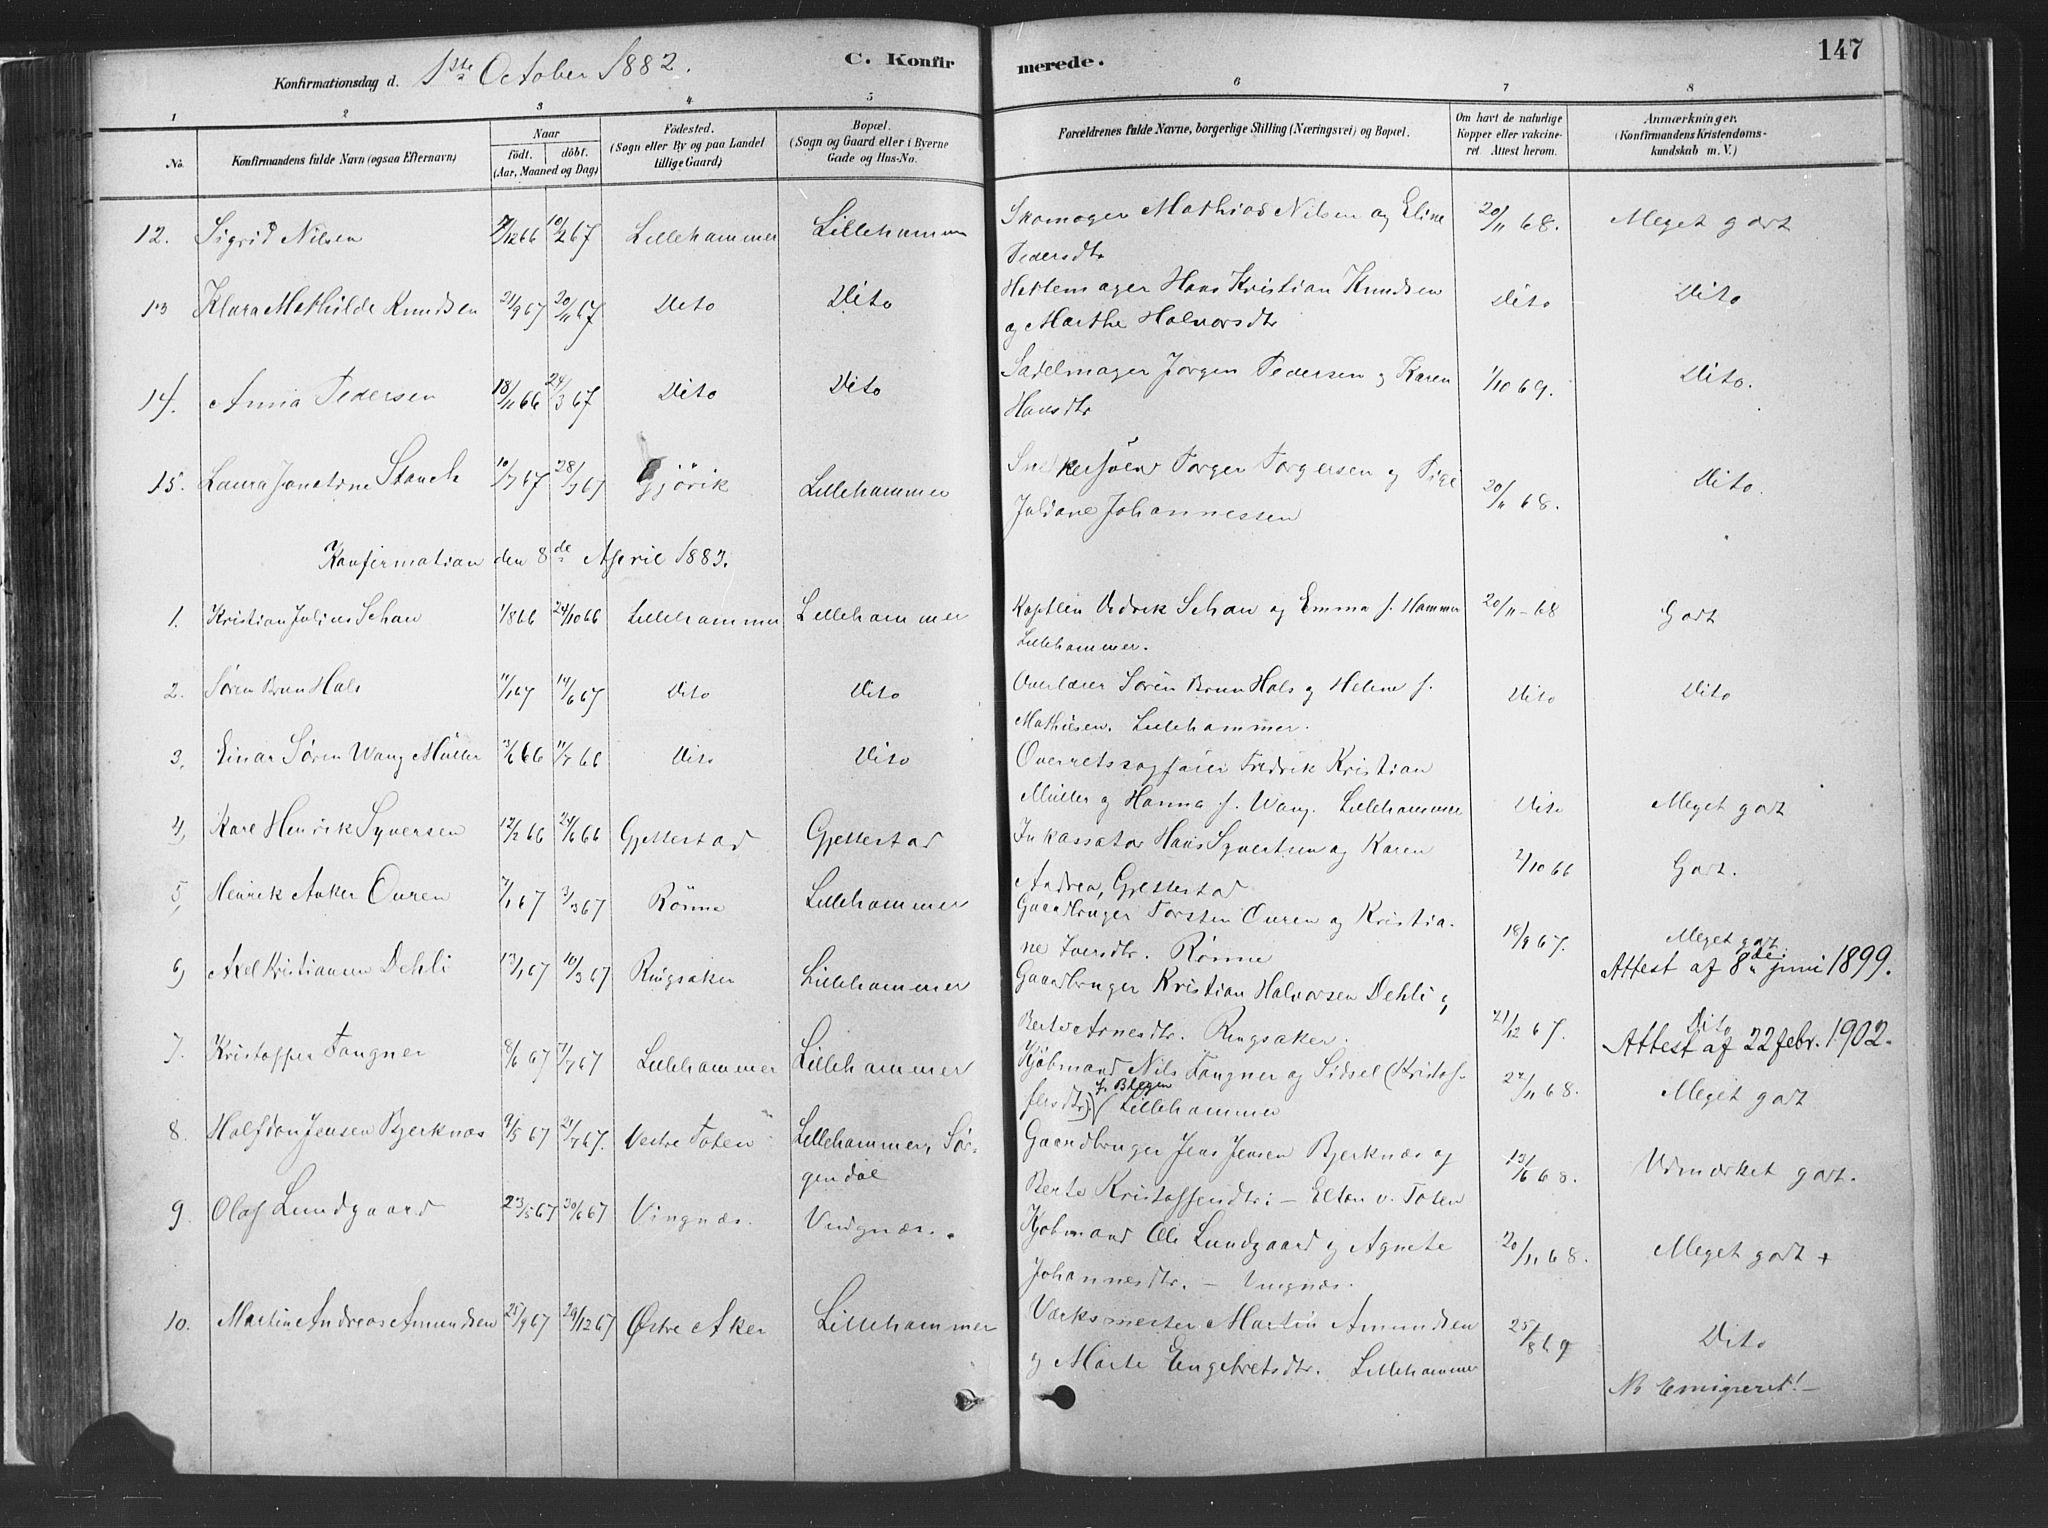 SAH, Fåberg prestekontor, H/Ha/Haa/L0010: Parish register (official) no. 10, 1879-1900, p. 147